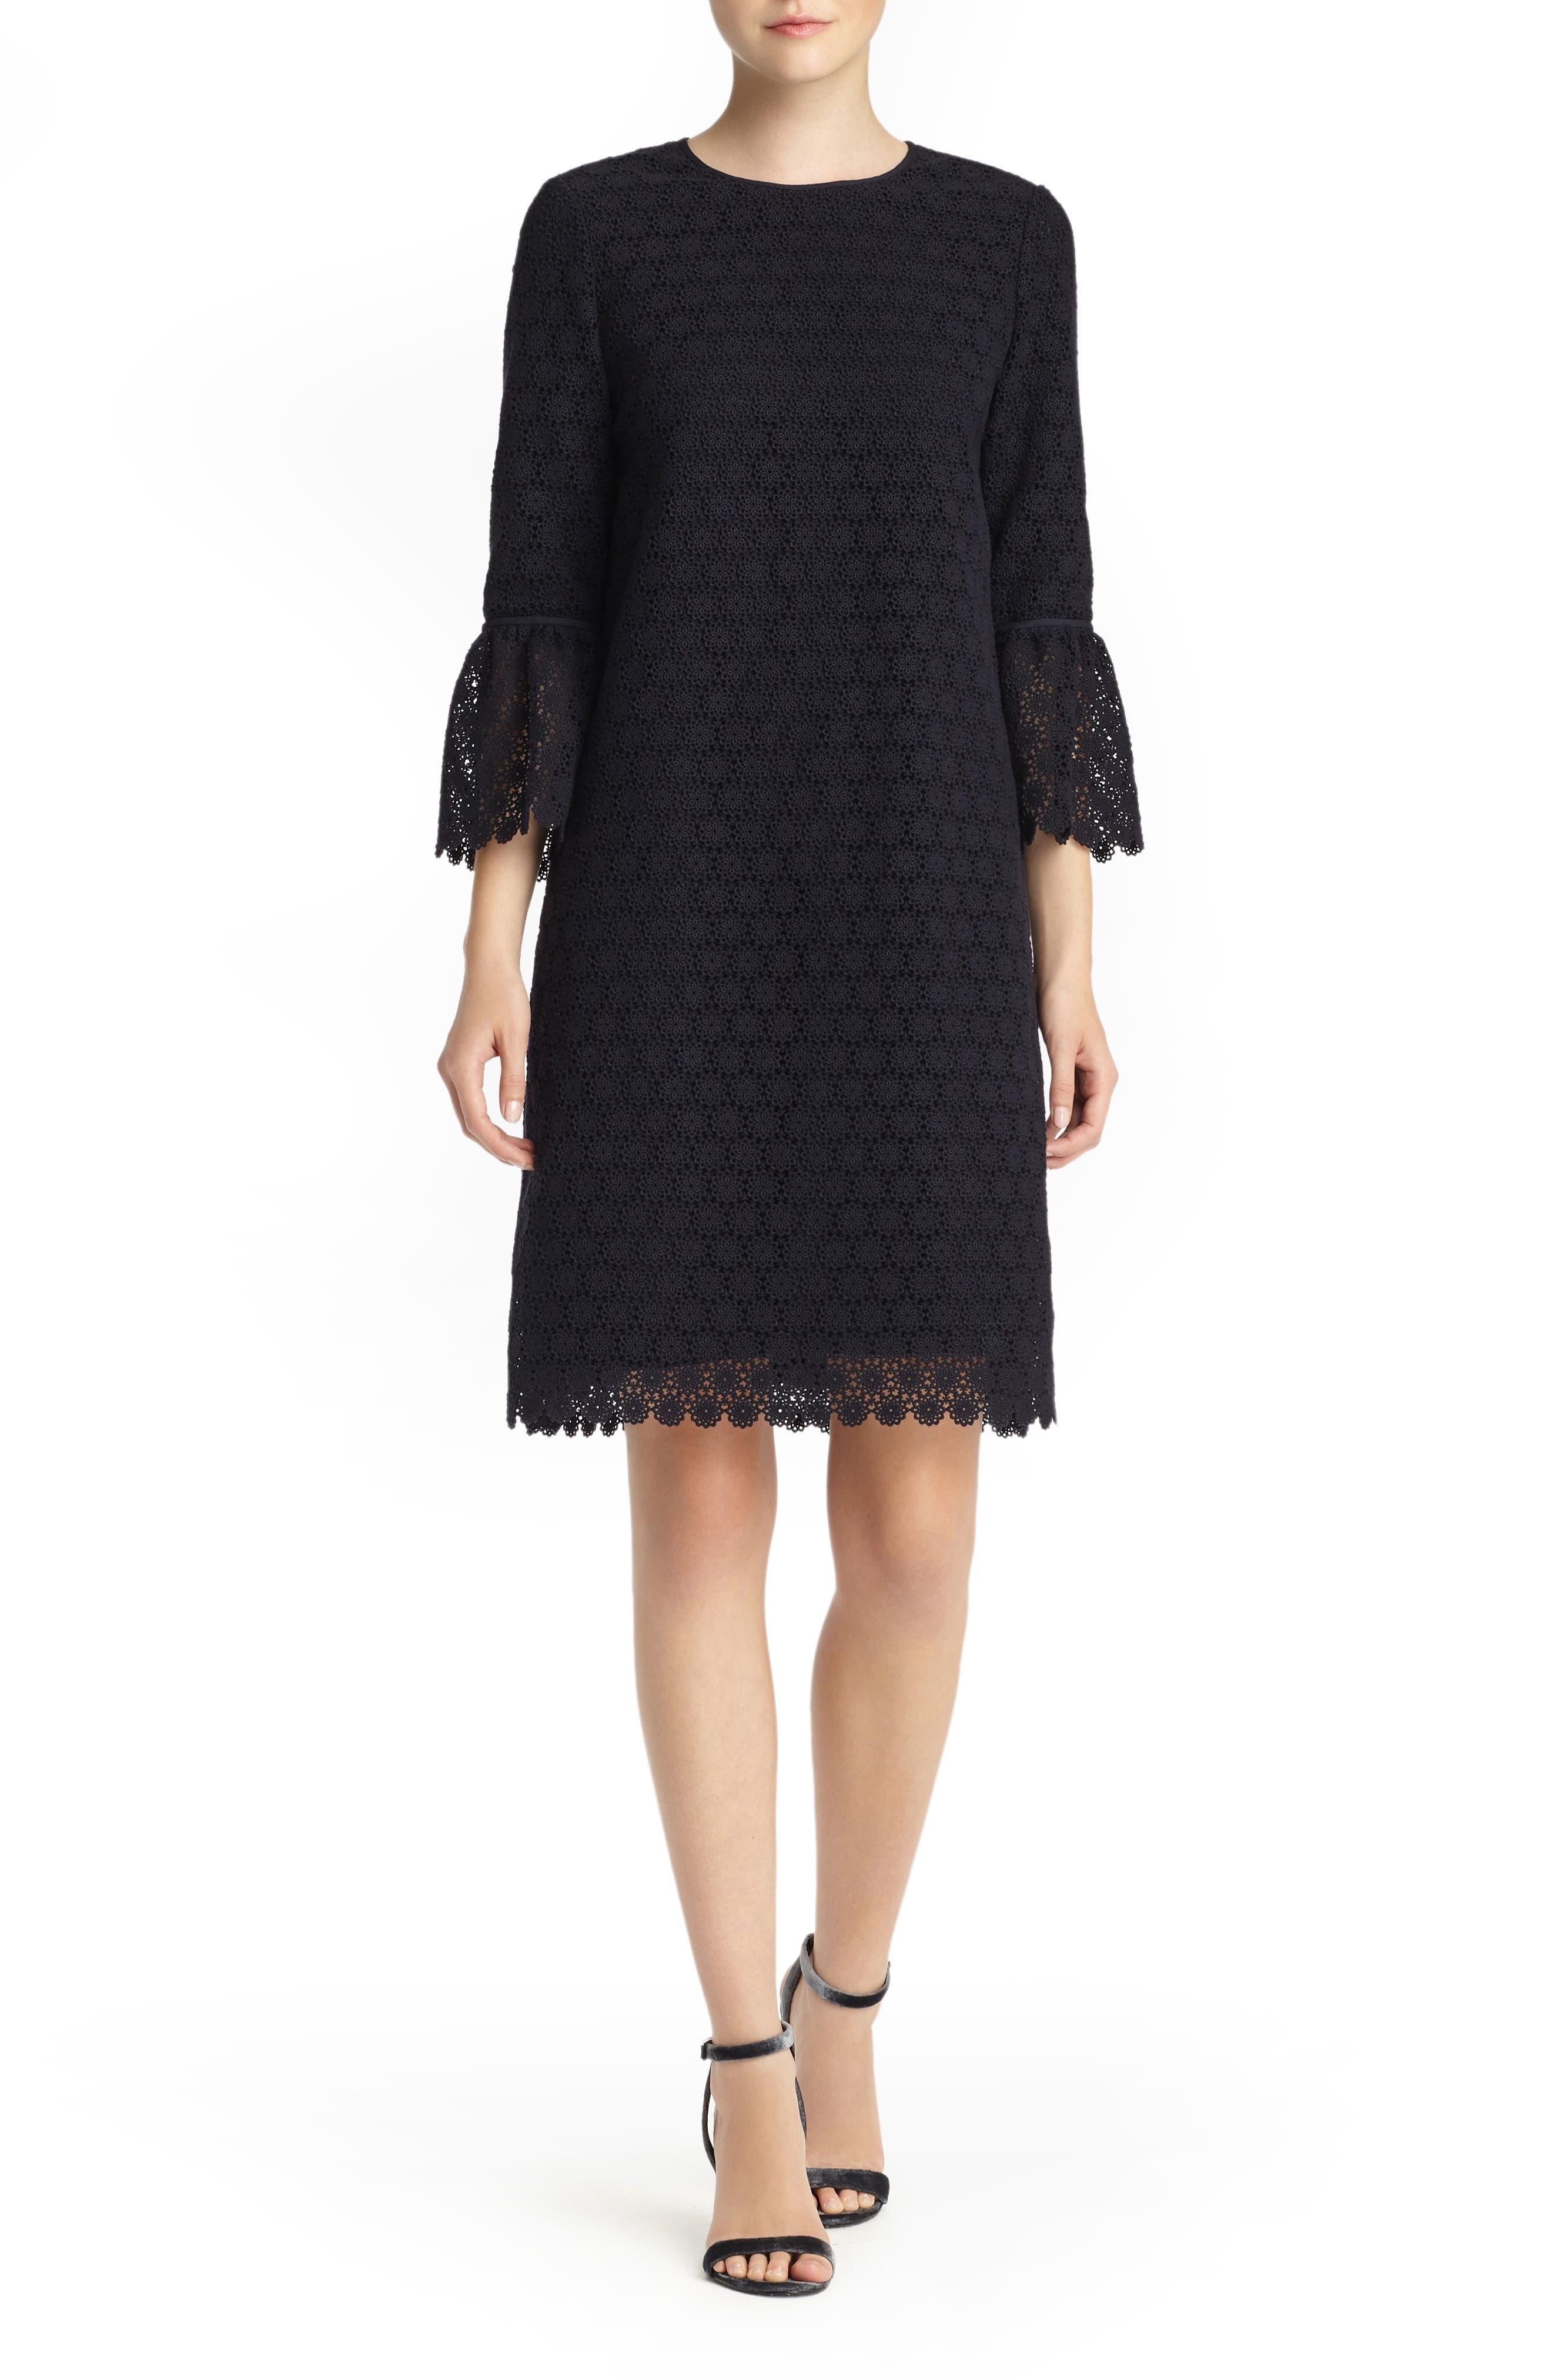 Sidra Bell Sleeve Lace Dress,                             Main thumbnail 1, color,                             479